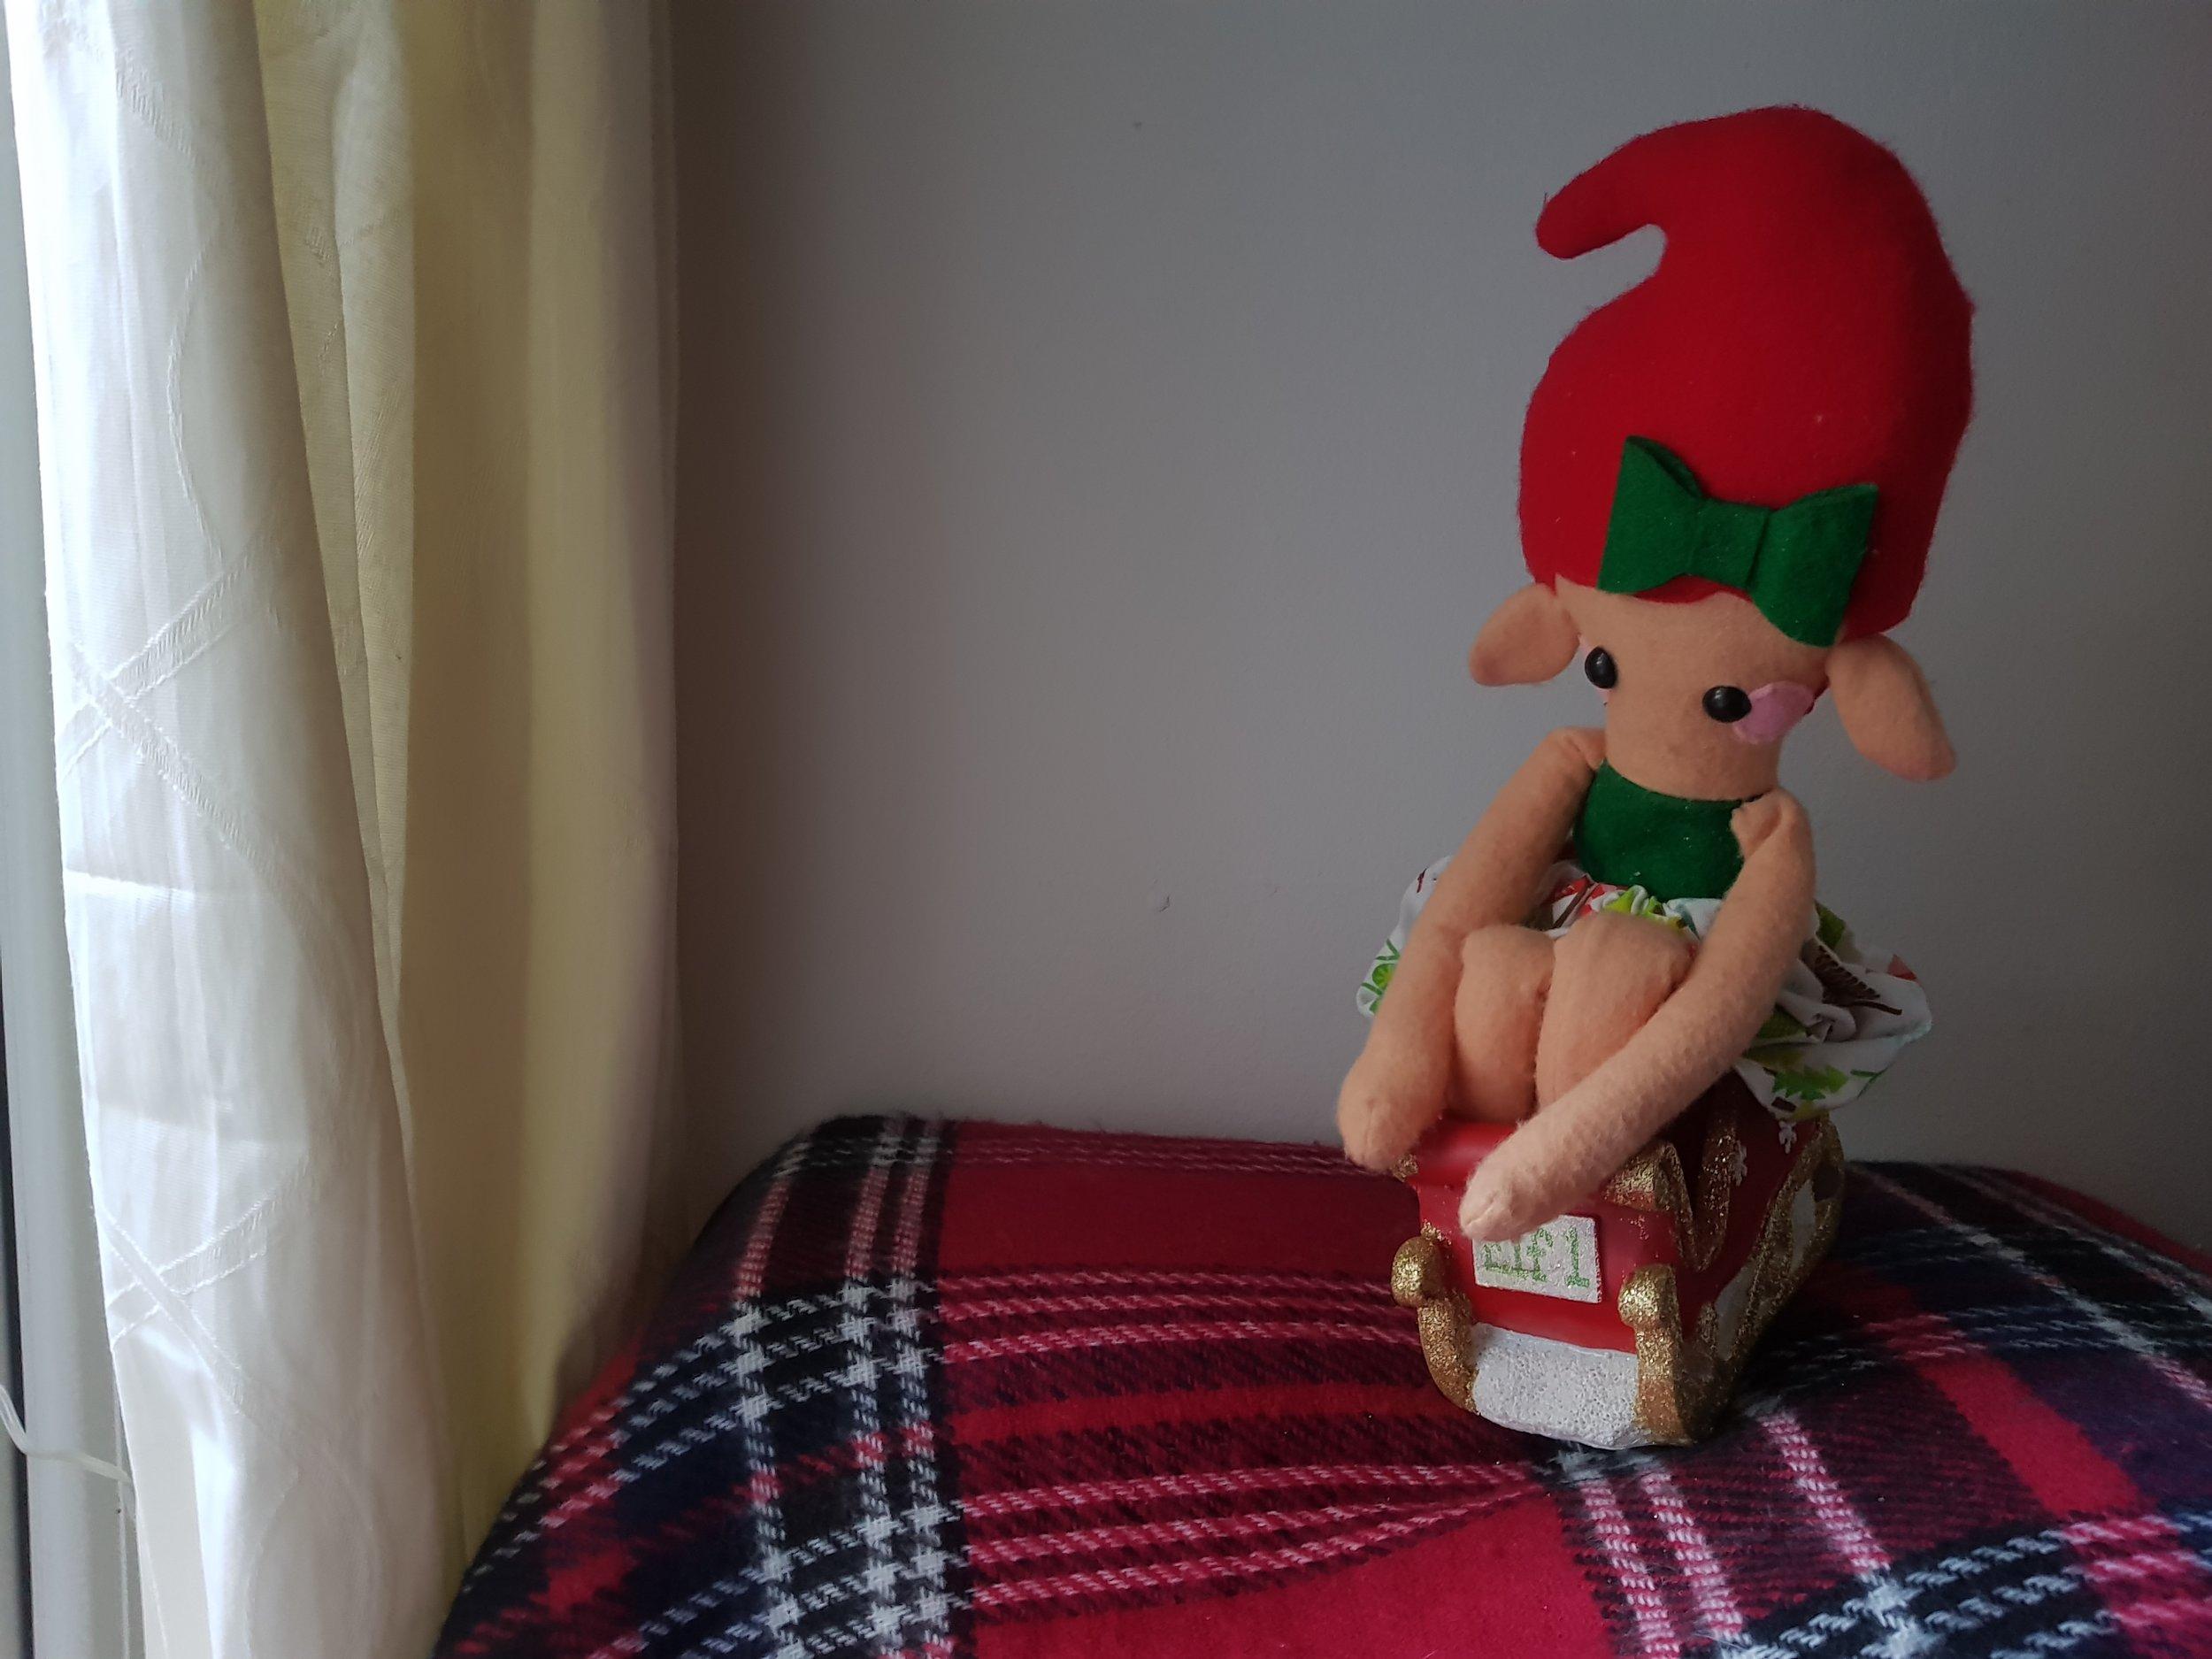 Elf on the Shelf sleigh ride